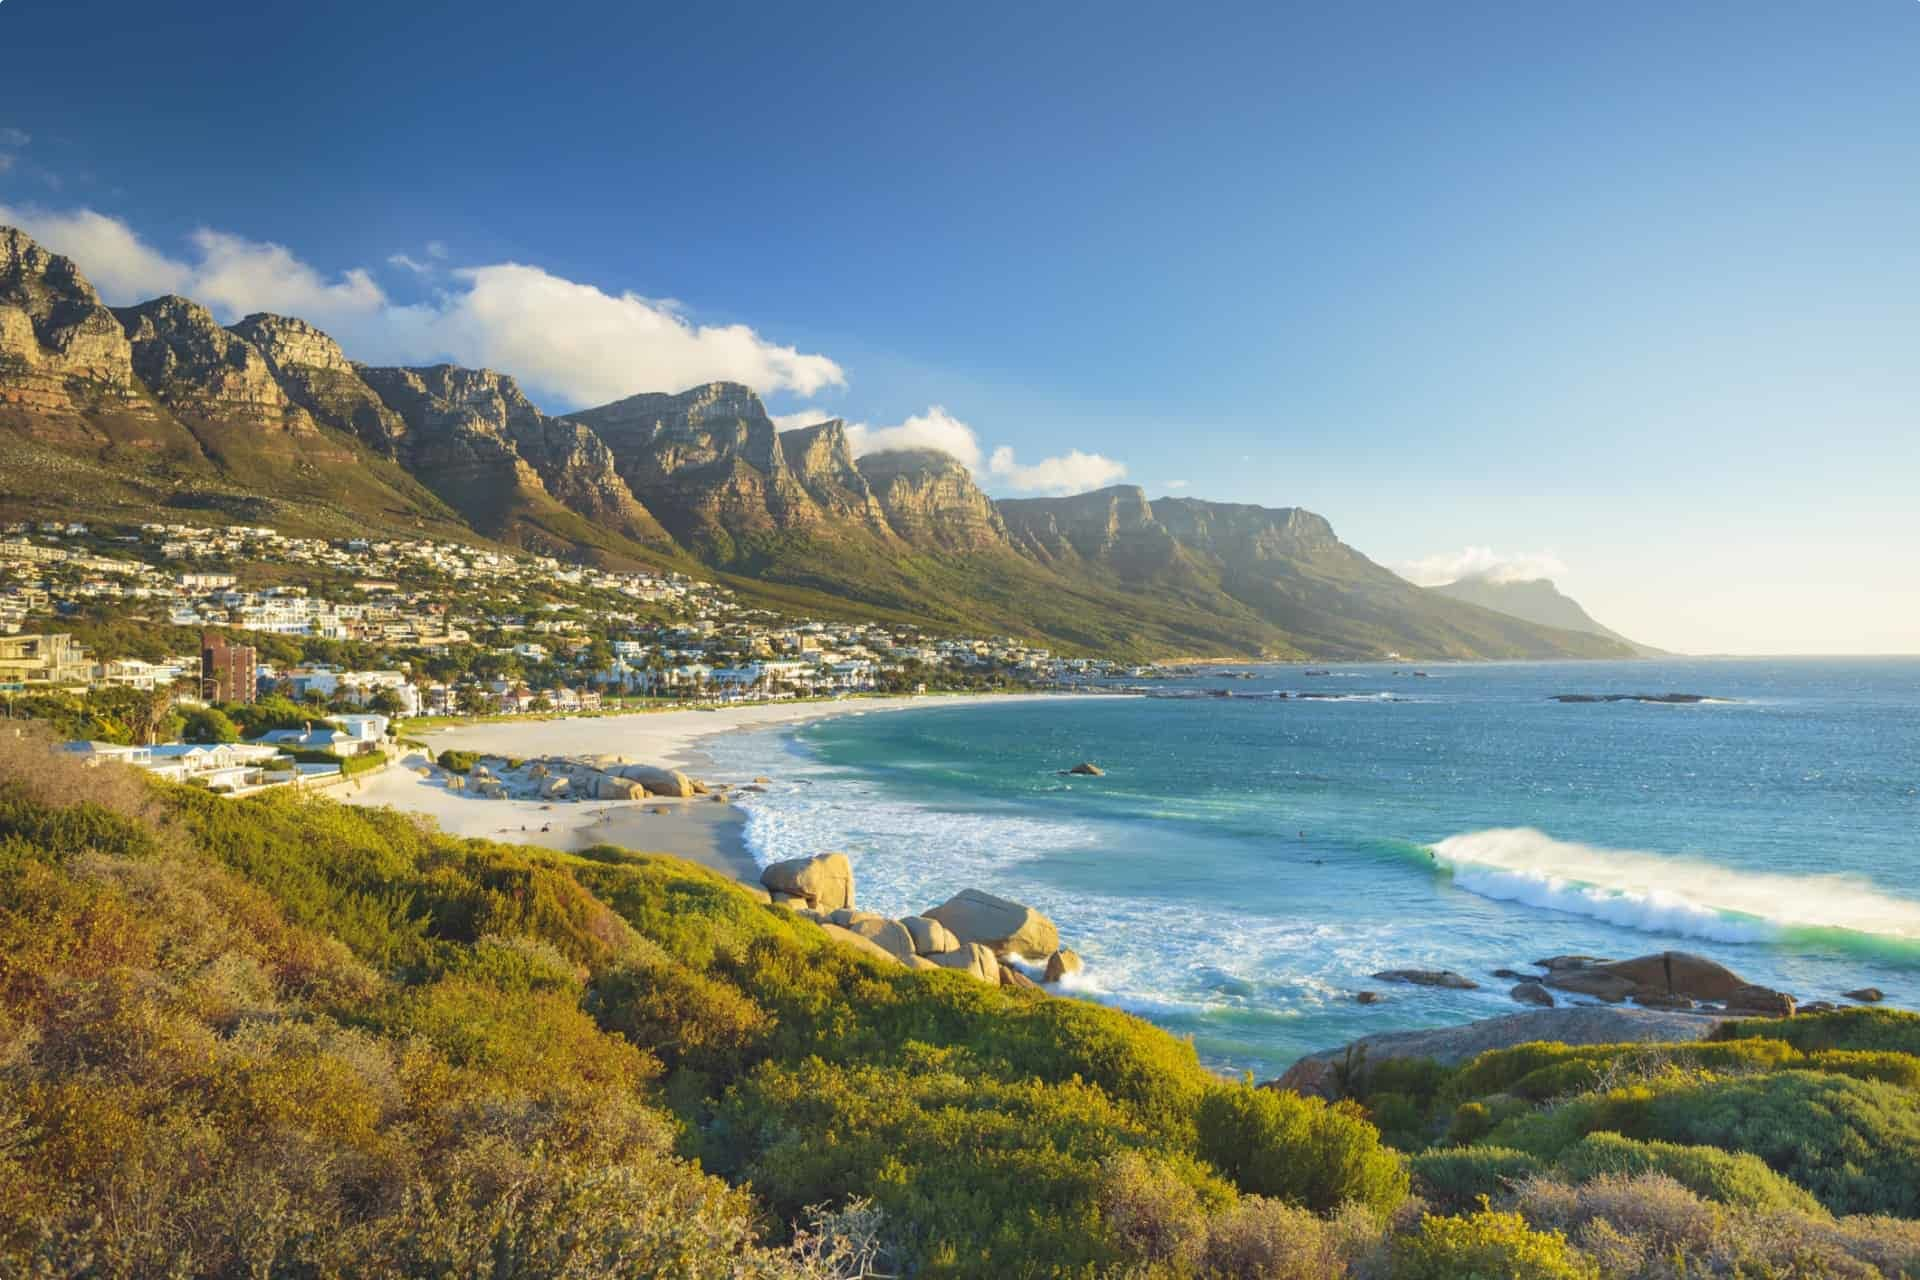 Southern Africa landscape